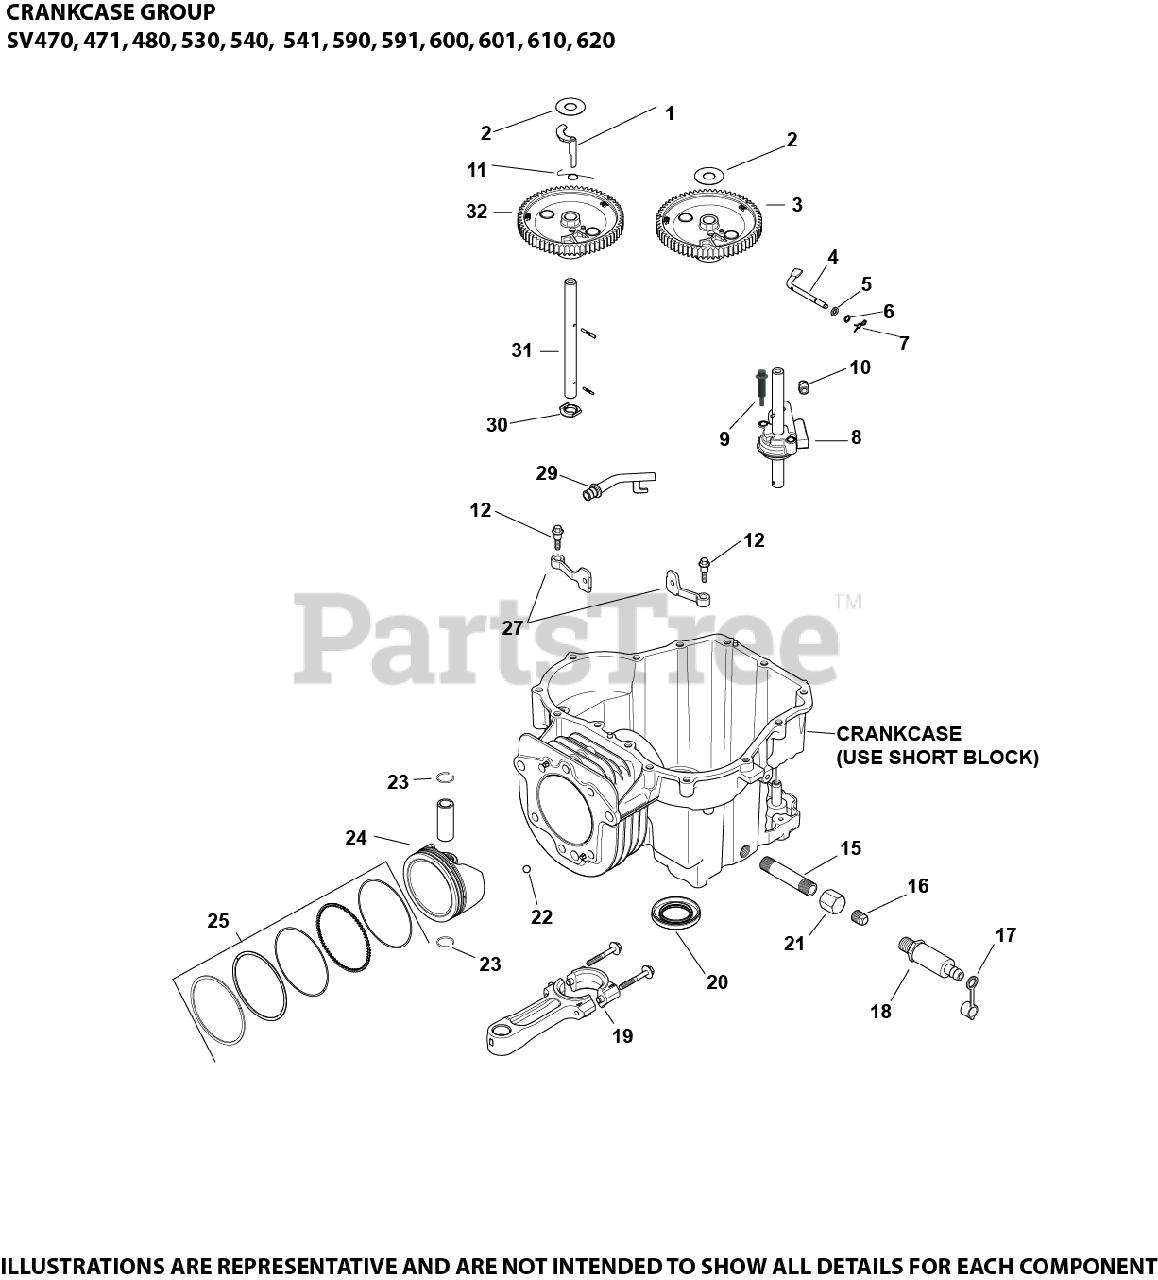 Kohler Parts On The Crankcase Group 2 20 22 Sv470 620